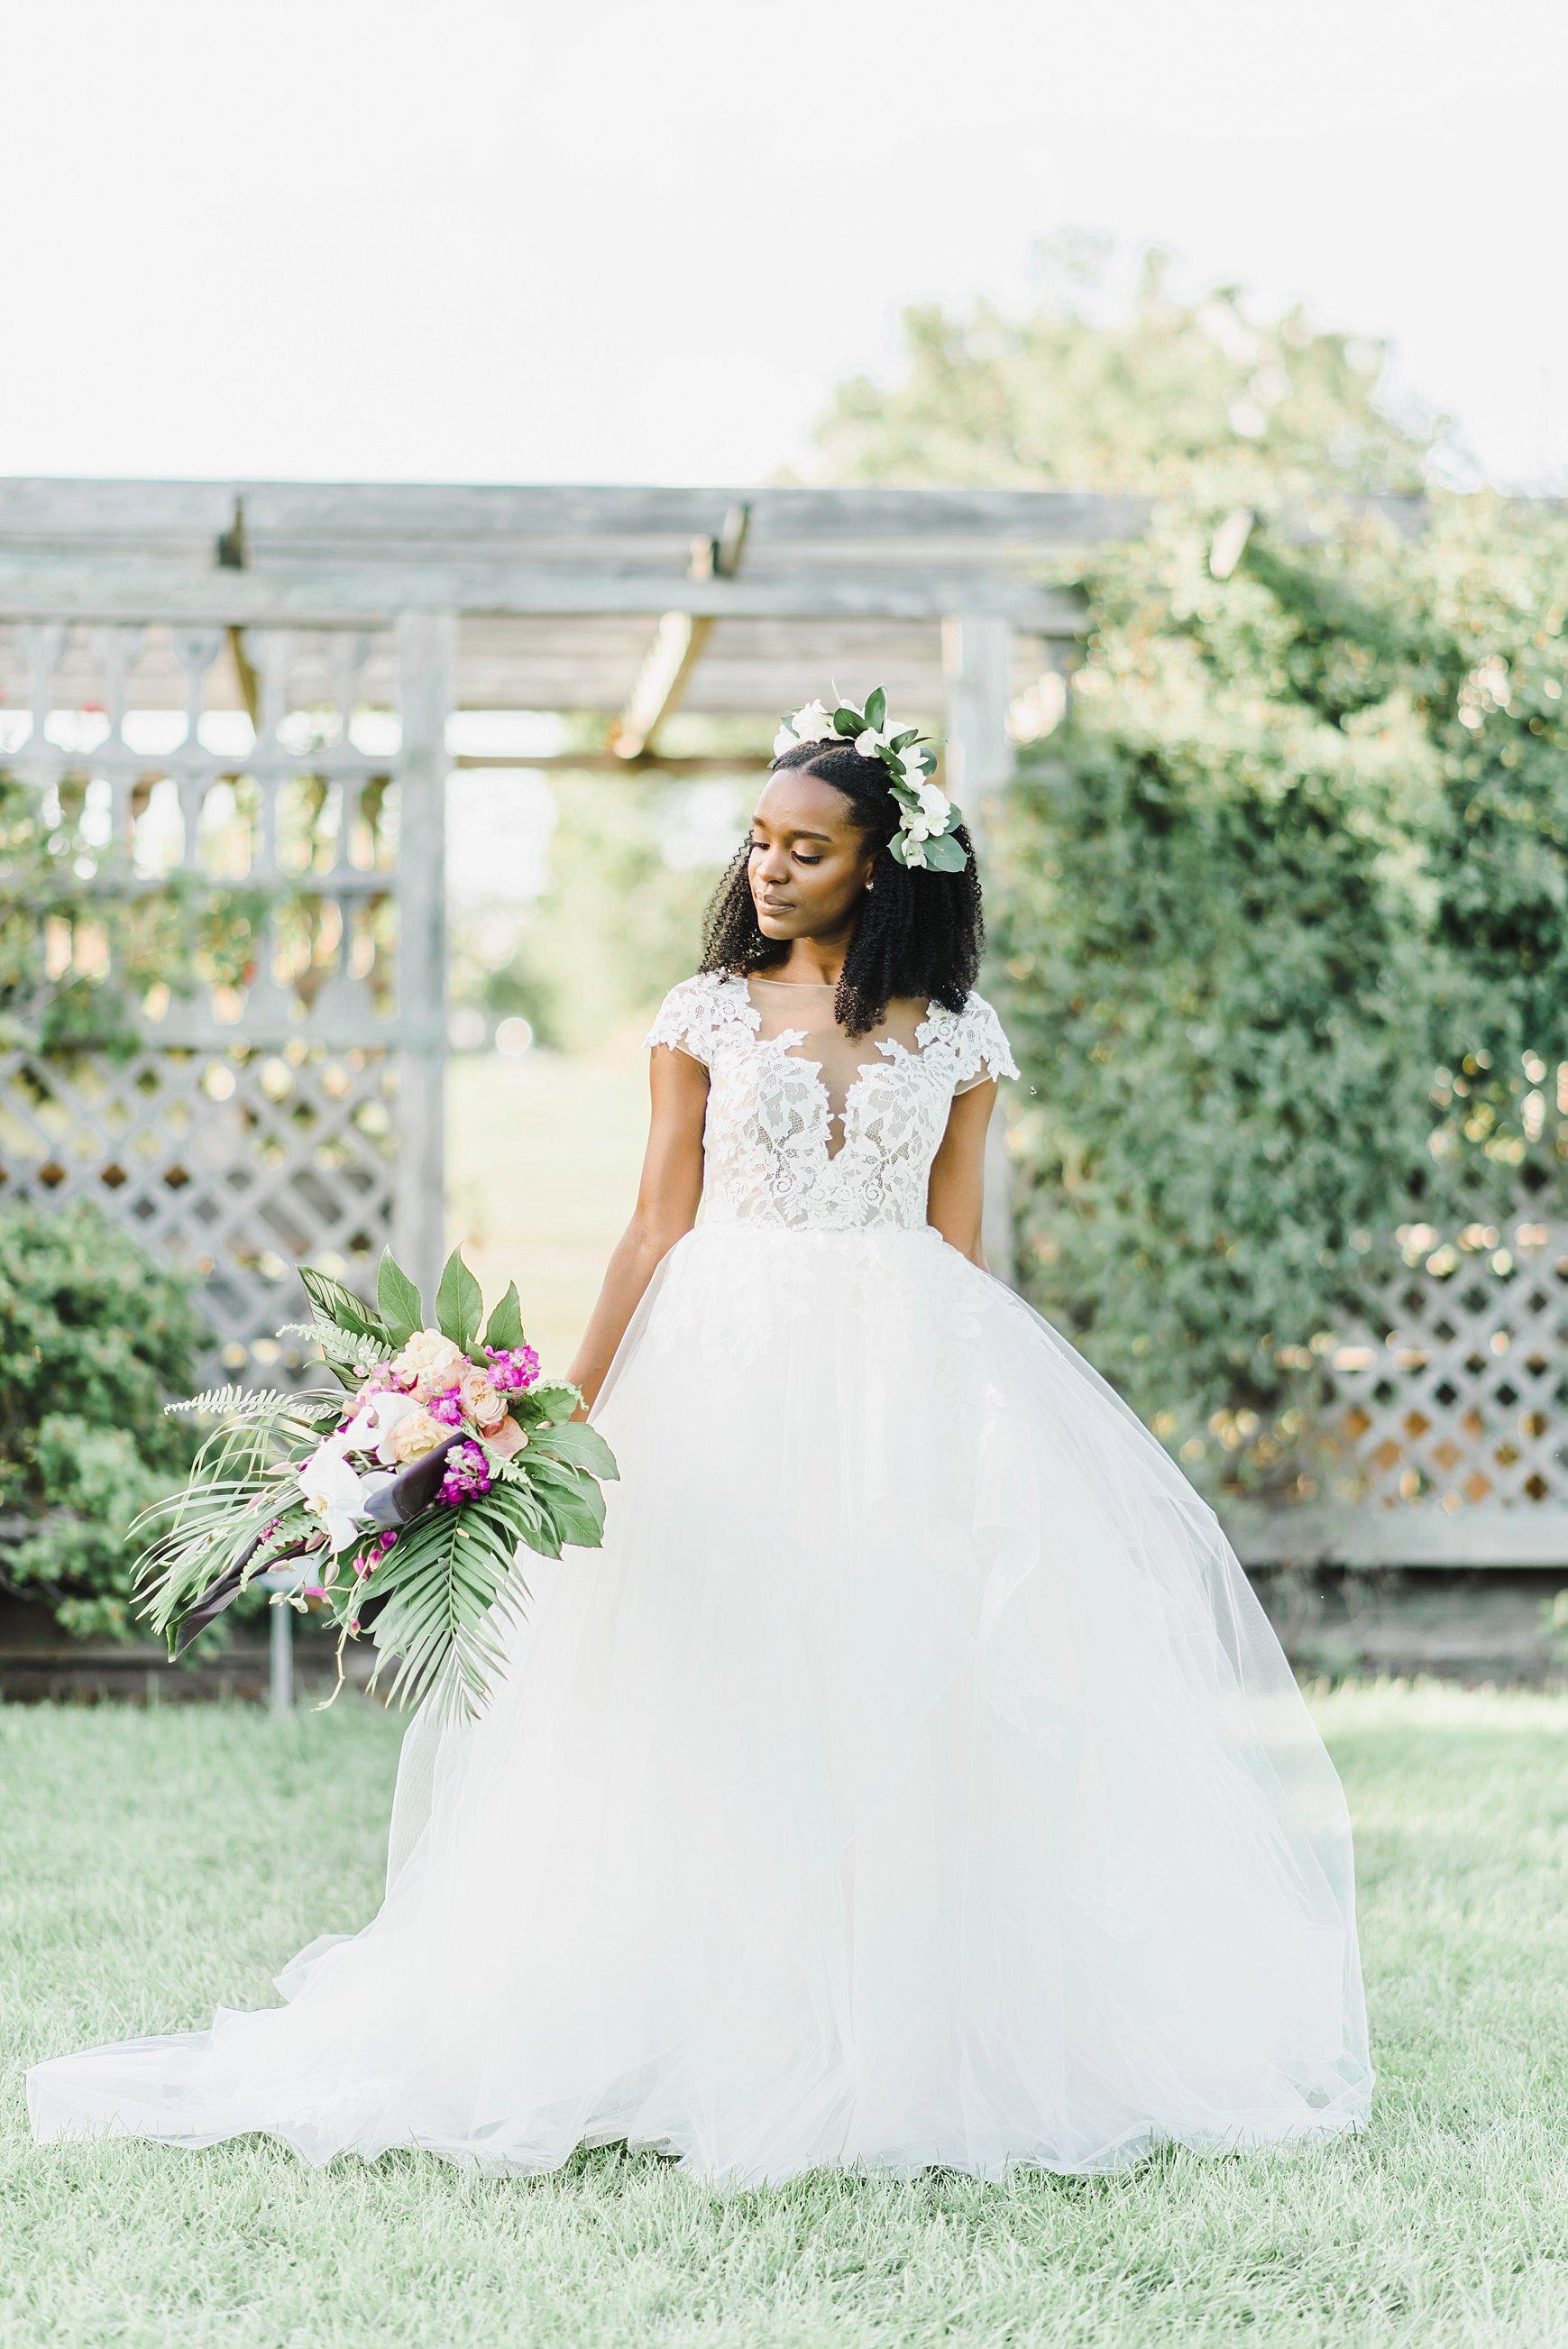 light airy indie fine art ottawa wedding photographer | Ali and Batoul Photography_0989.jpg